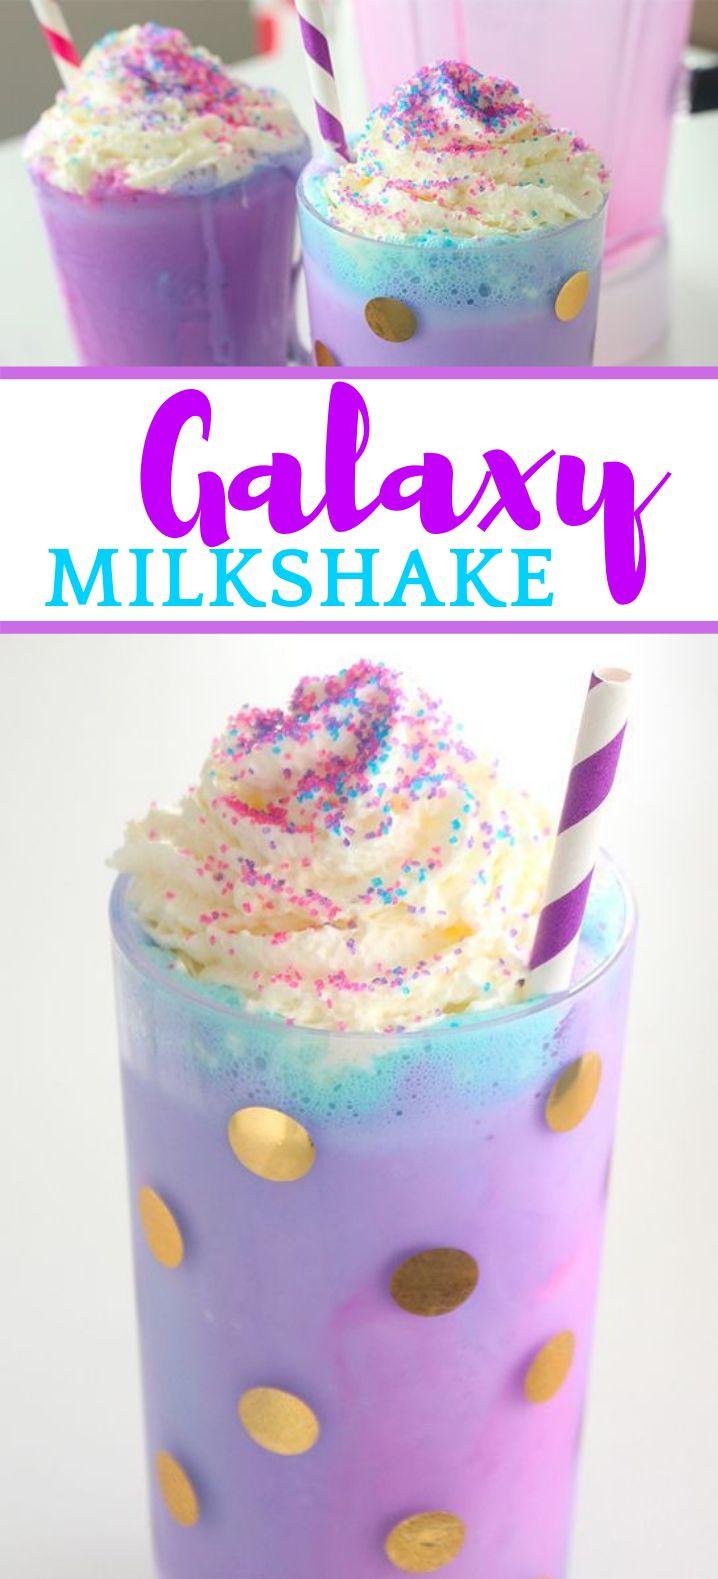 Galaxy Milkshake #Drinks #Vanilla